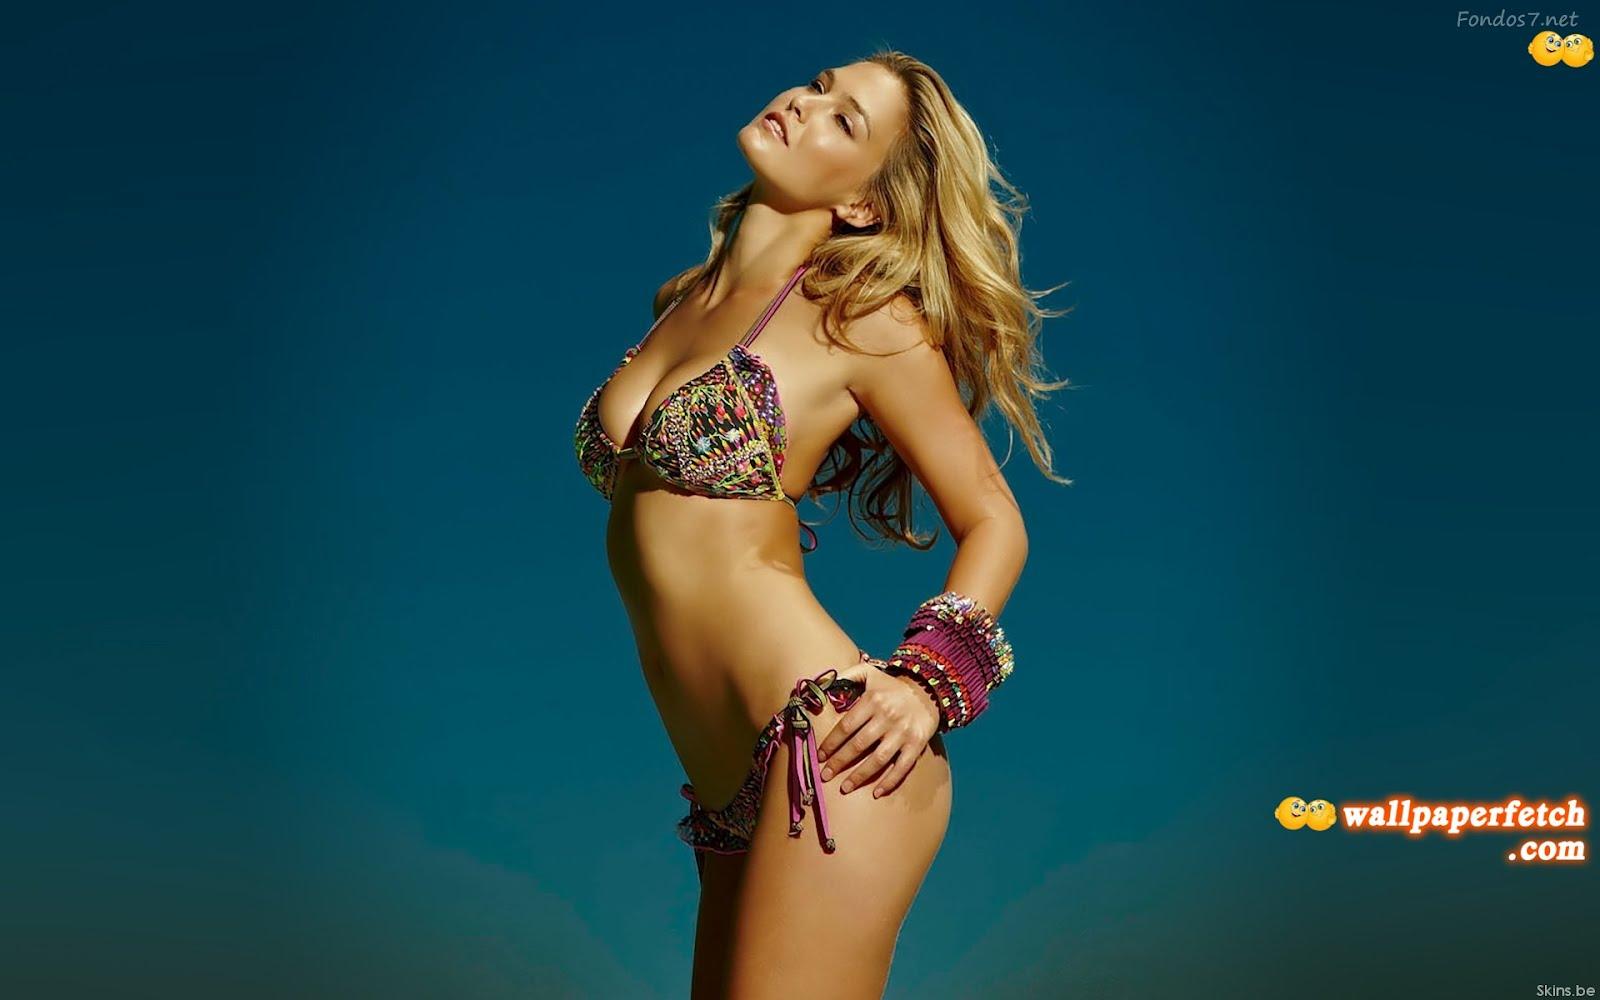 Model Bar Refaeli. Bar Refaeli Body Paint. View Original . [Updated on ...